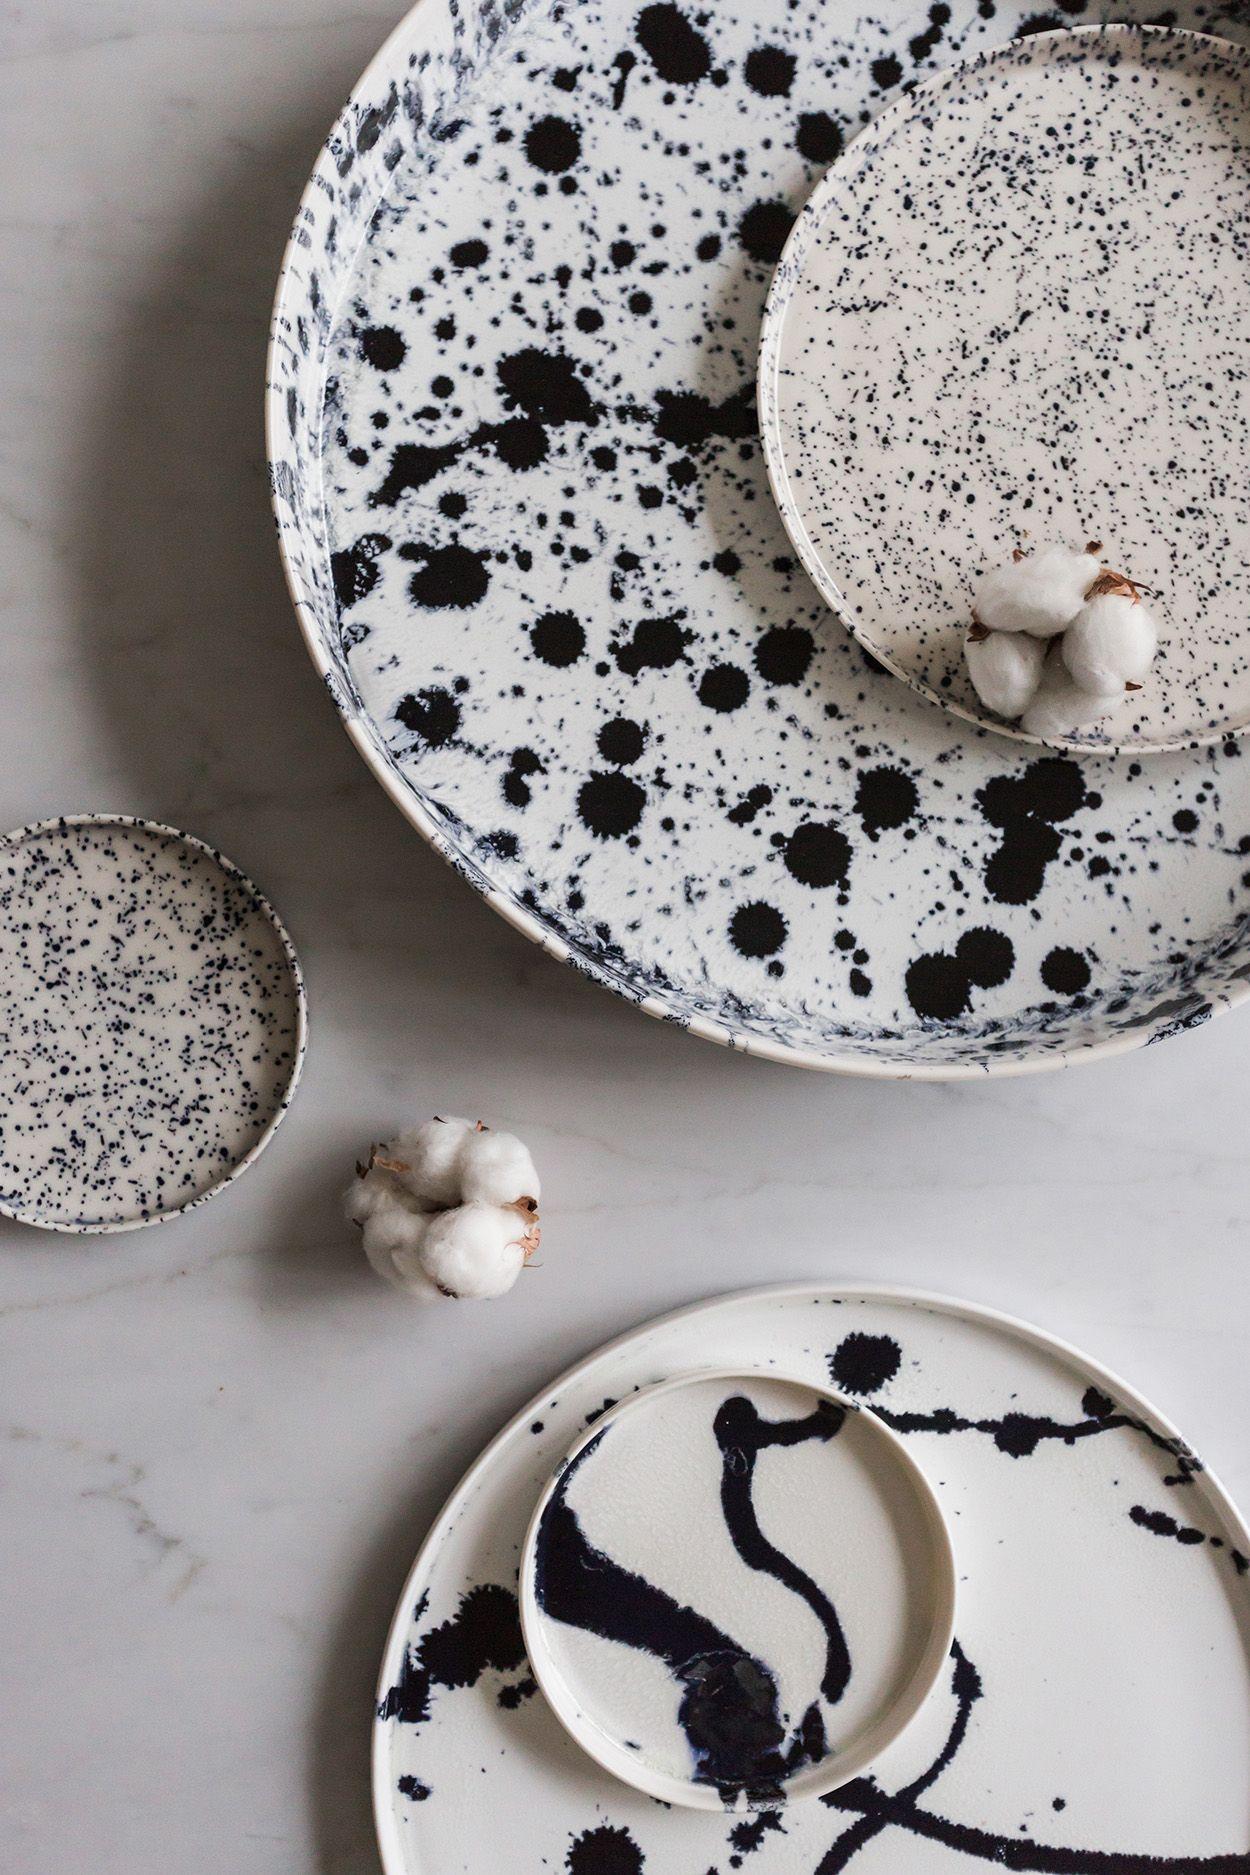 Monochrome Splatter Paint Ceramics; DIY craft project inspiration